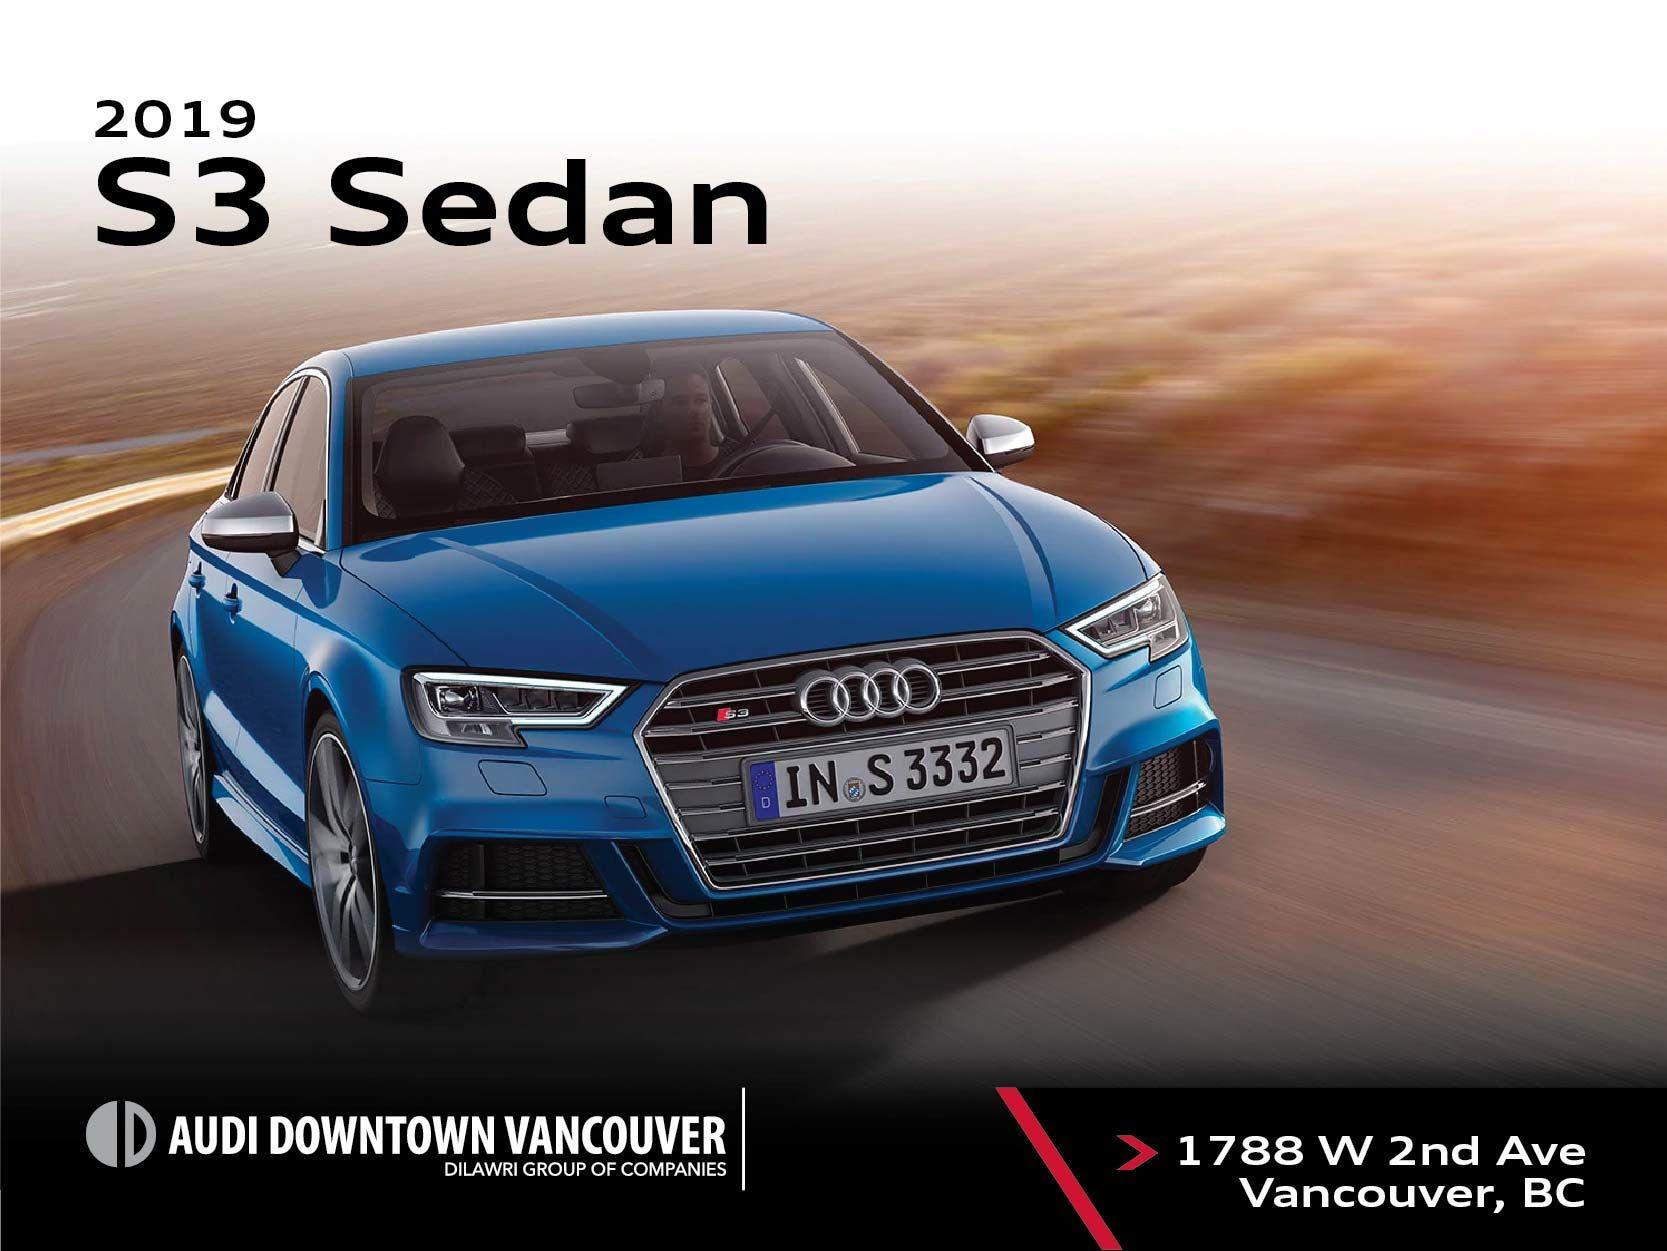 The 2019 Audi S3 Sedan